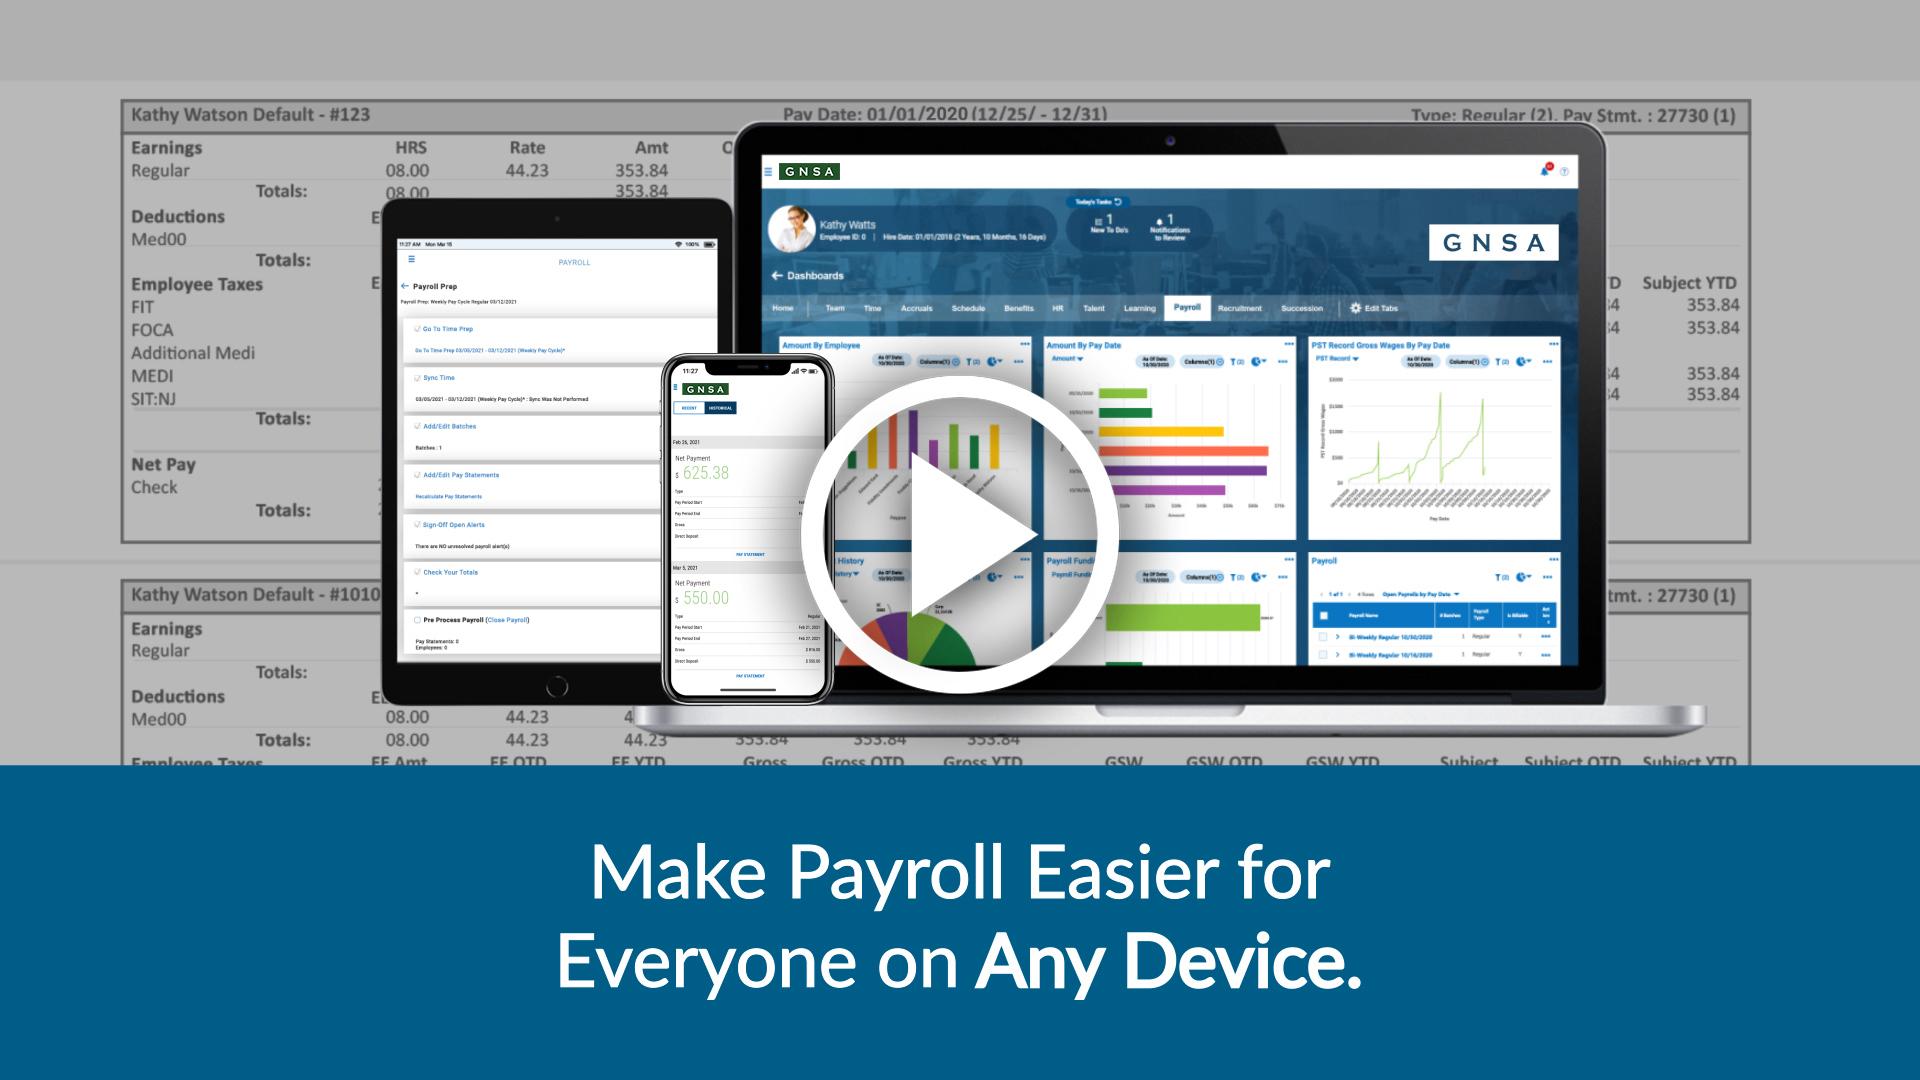 GNSA Payroll Video Overview